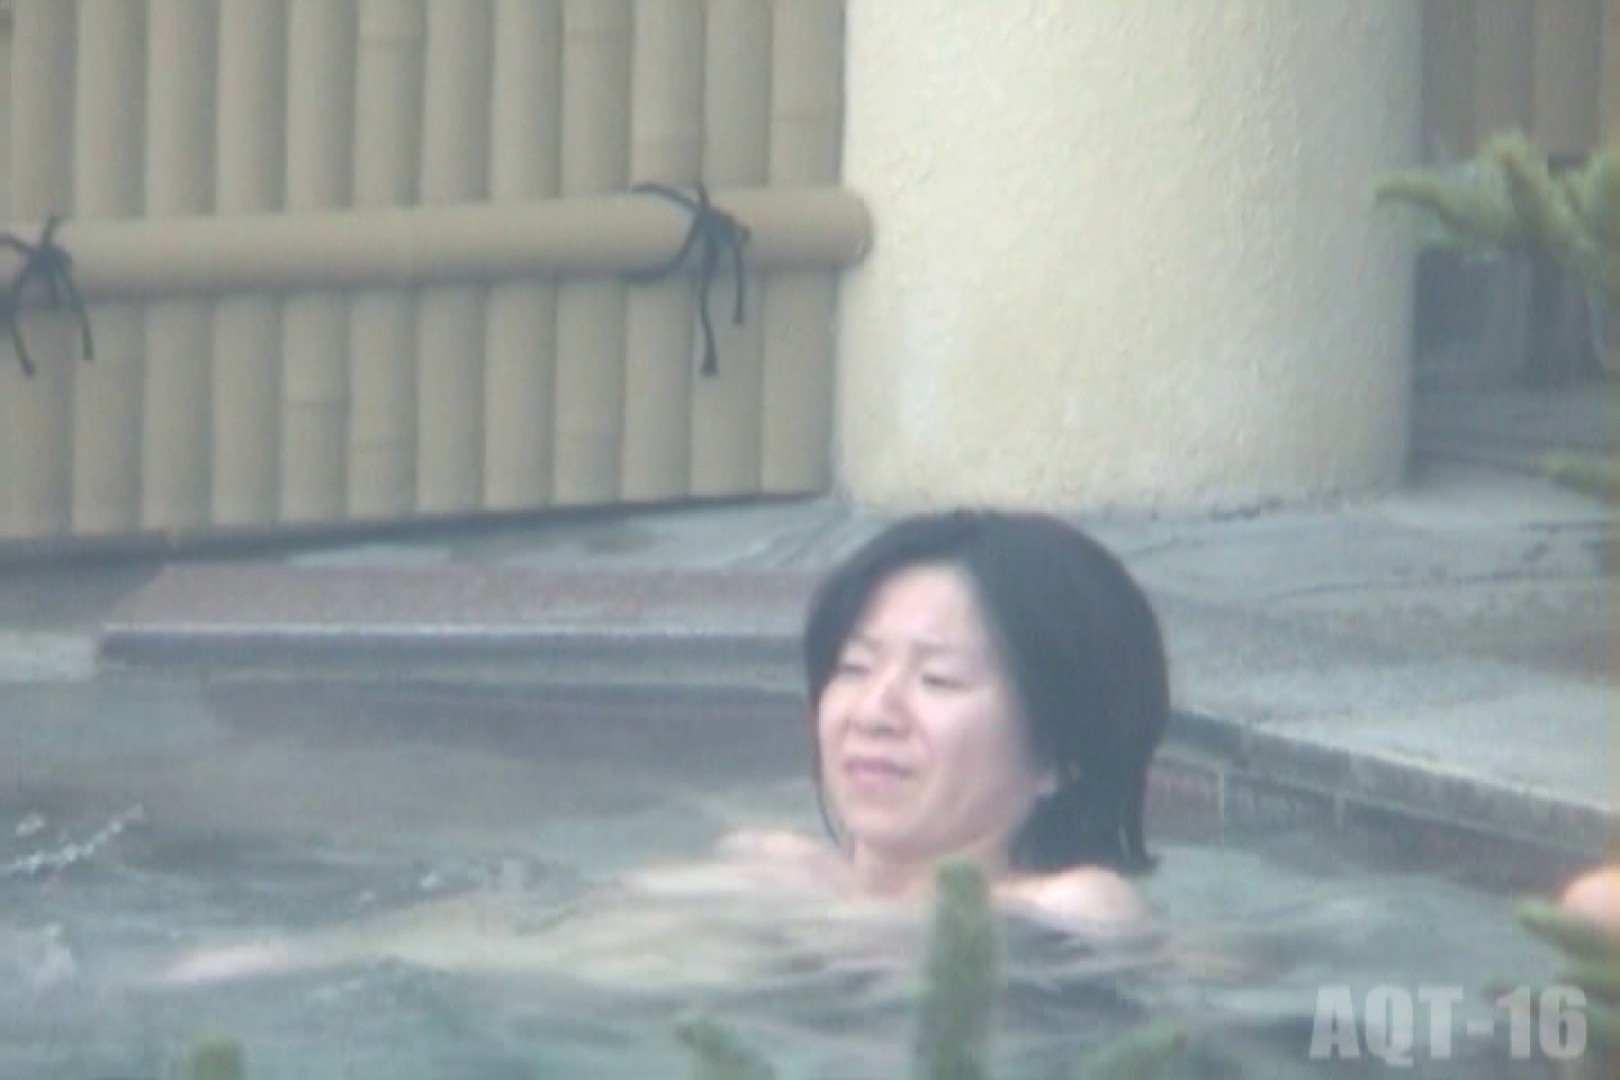 Aquaな露天風呂Vol.841 盗撮師作品 ワレメ動画紹介 77pic 56